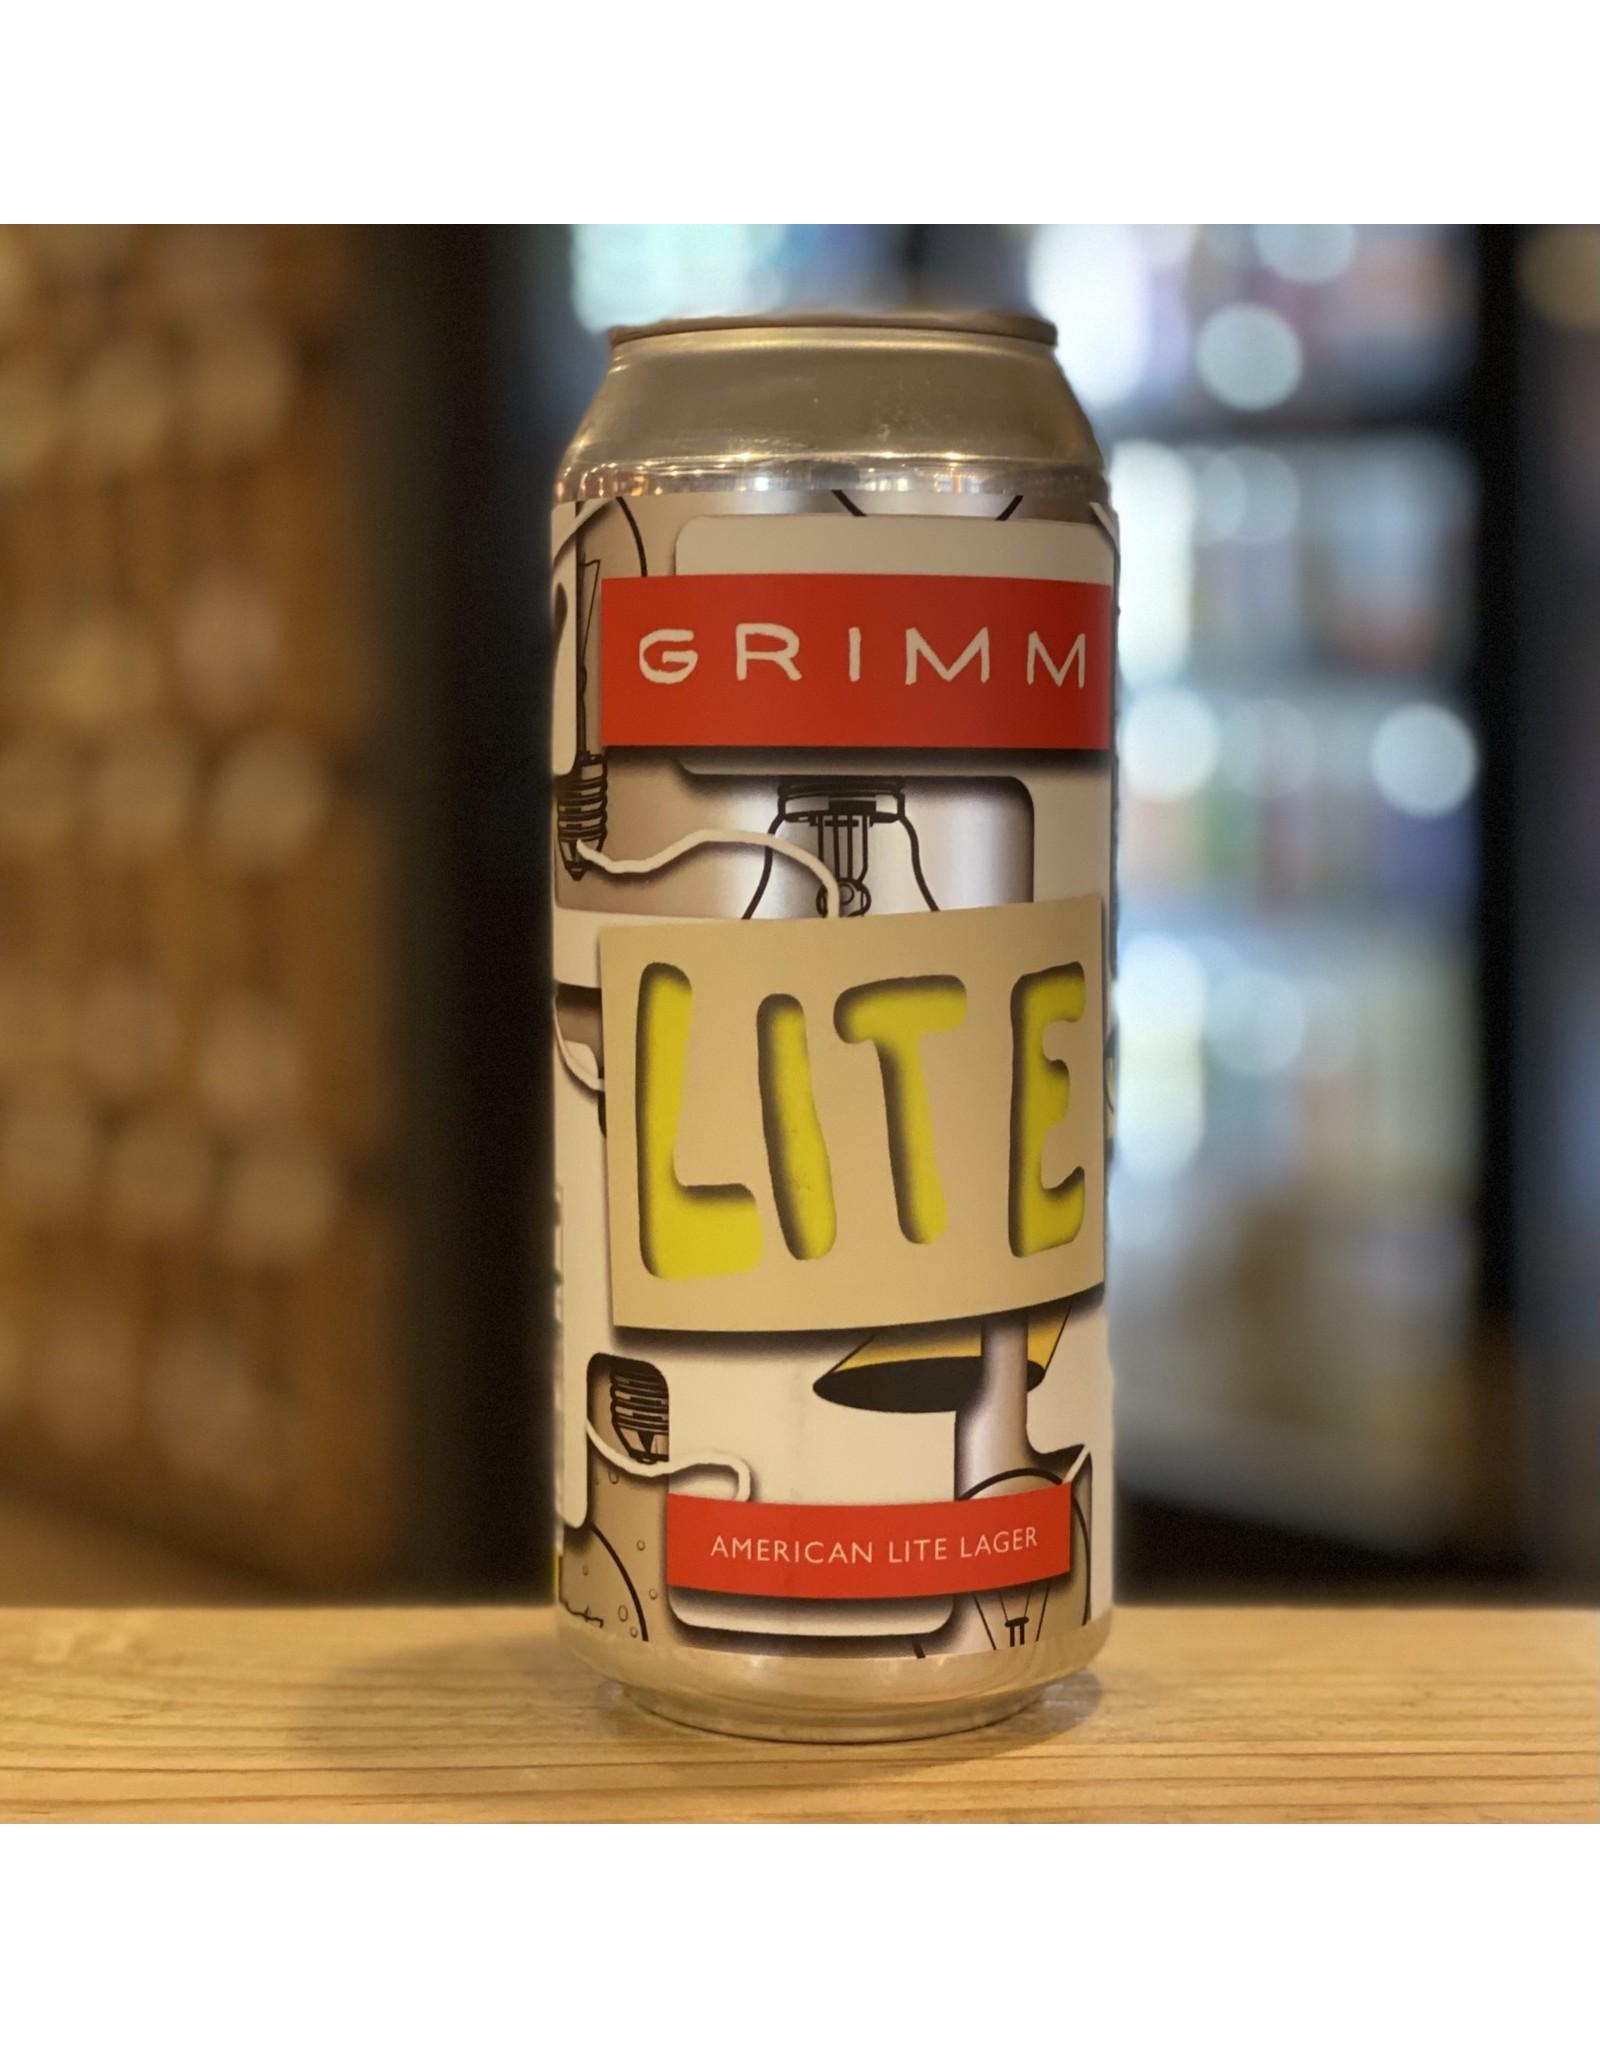 "Grimm ""Lite"" American Lite Lager - Brooklyn, NY"